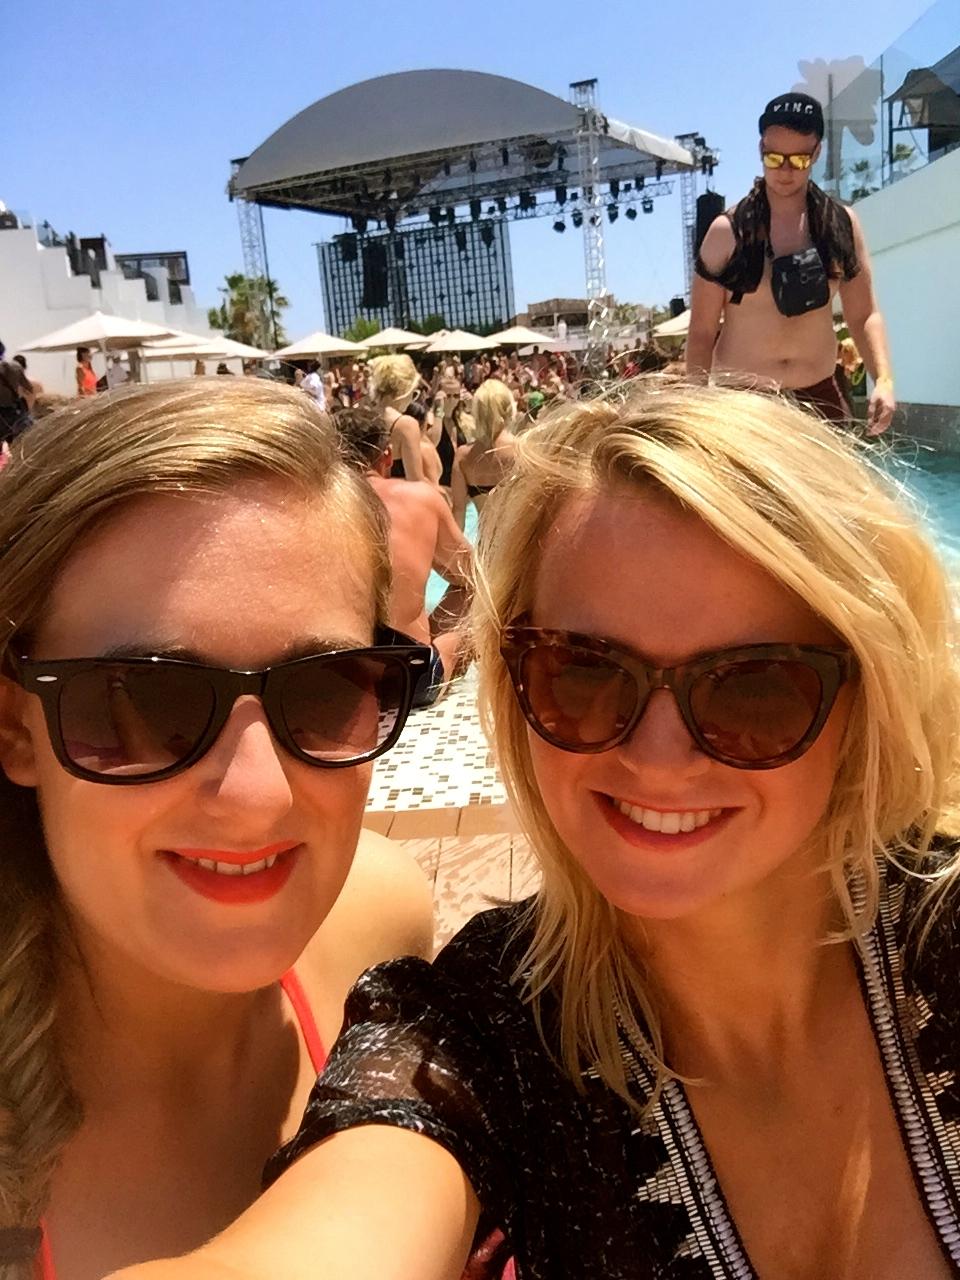 Girls at the Hard Rock Hotel Ibiza pool party